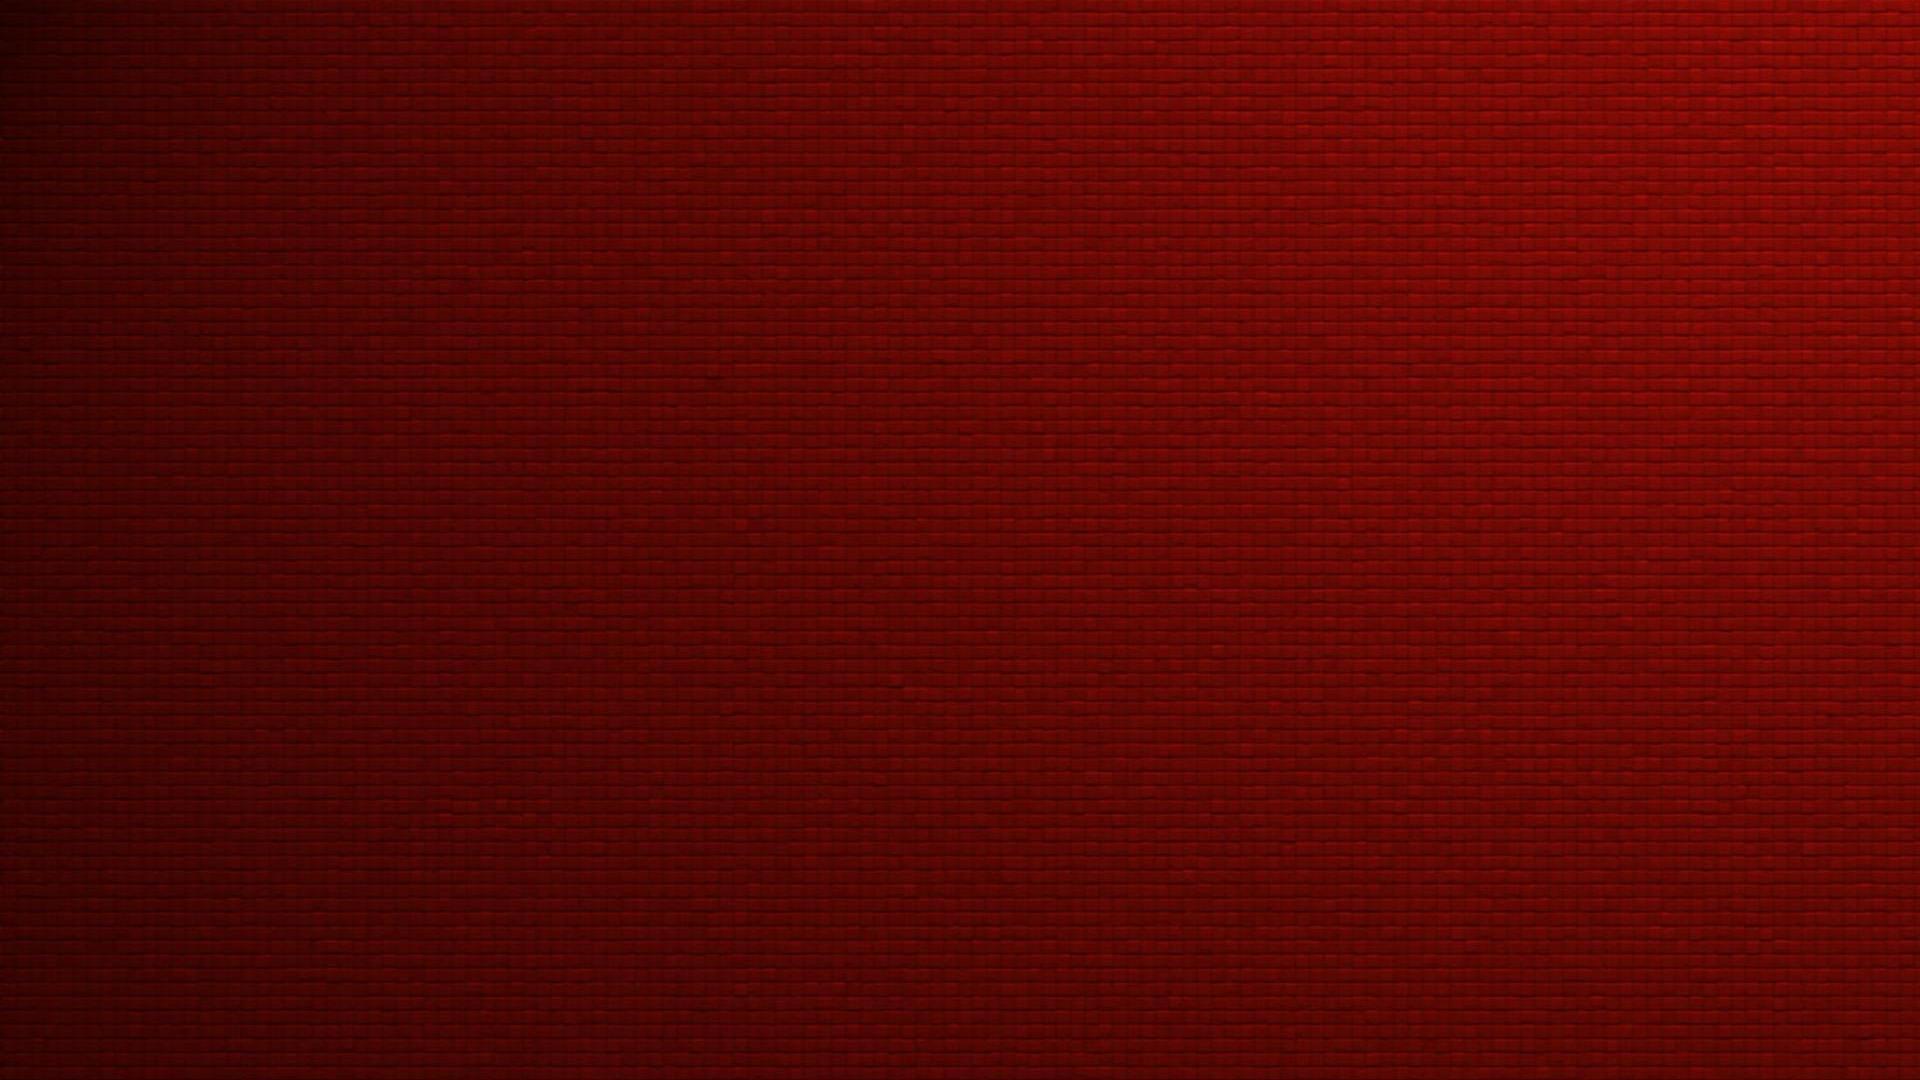 1920x1080 Red Desktop Wallpaper Abstract Red Wallpaper 1920x1080